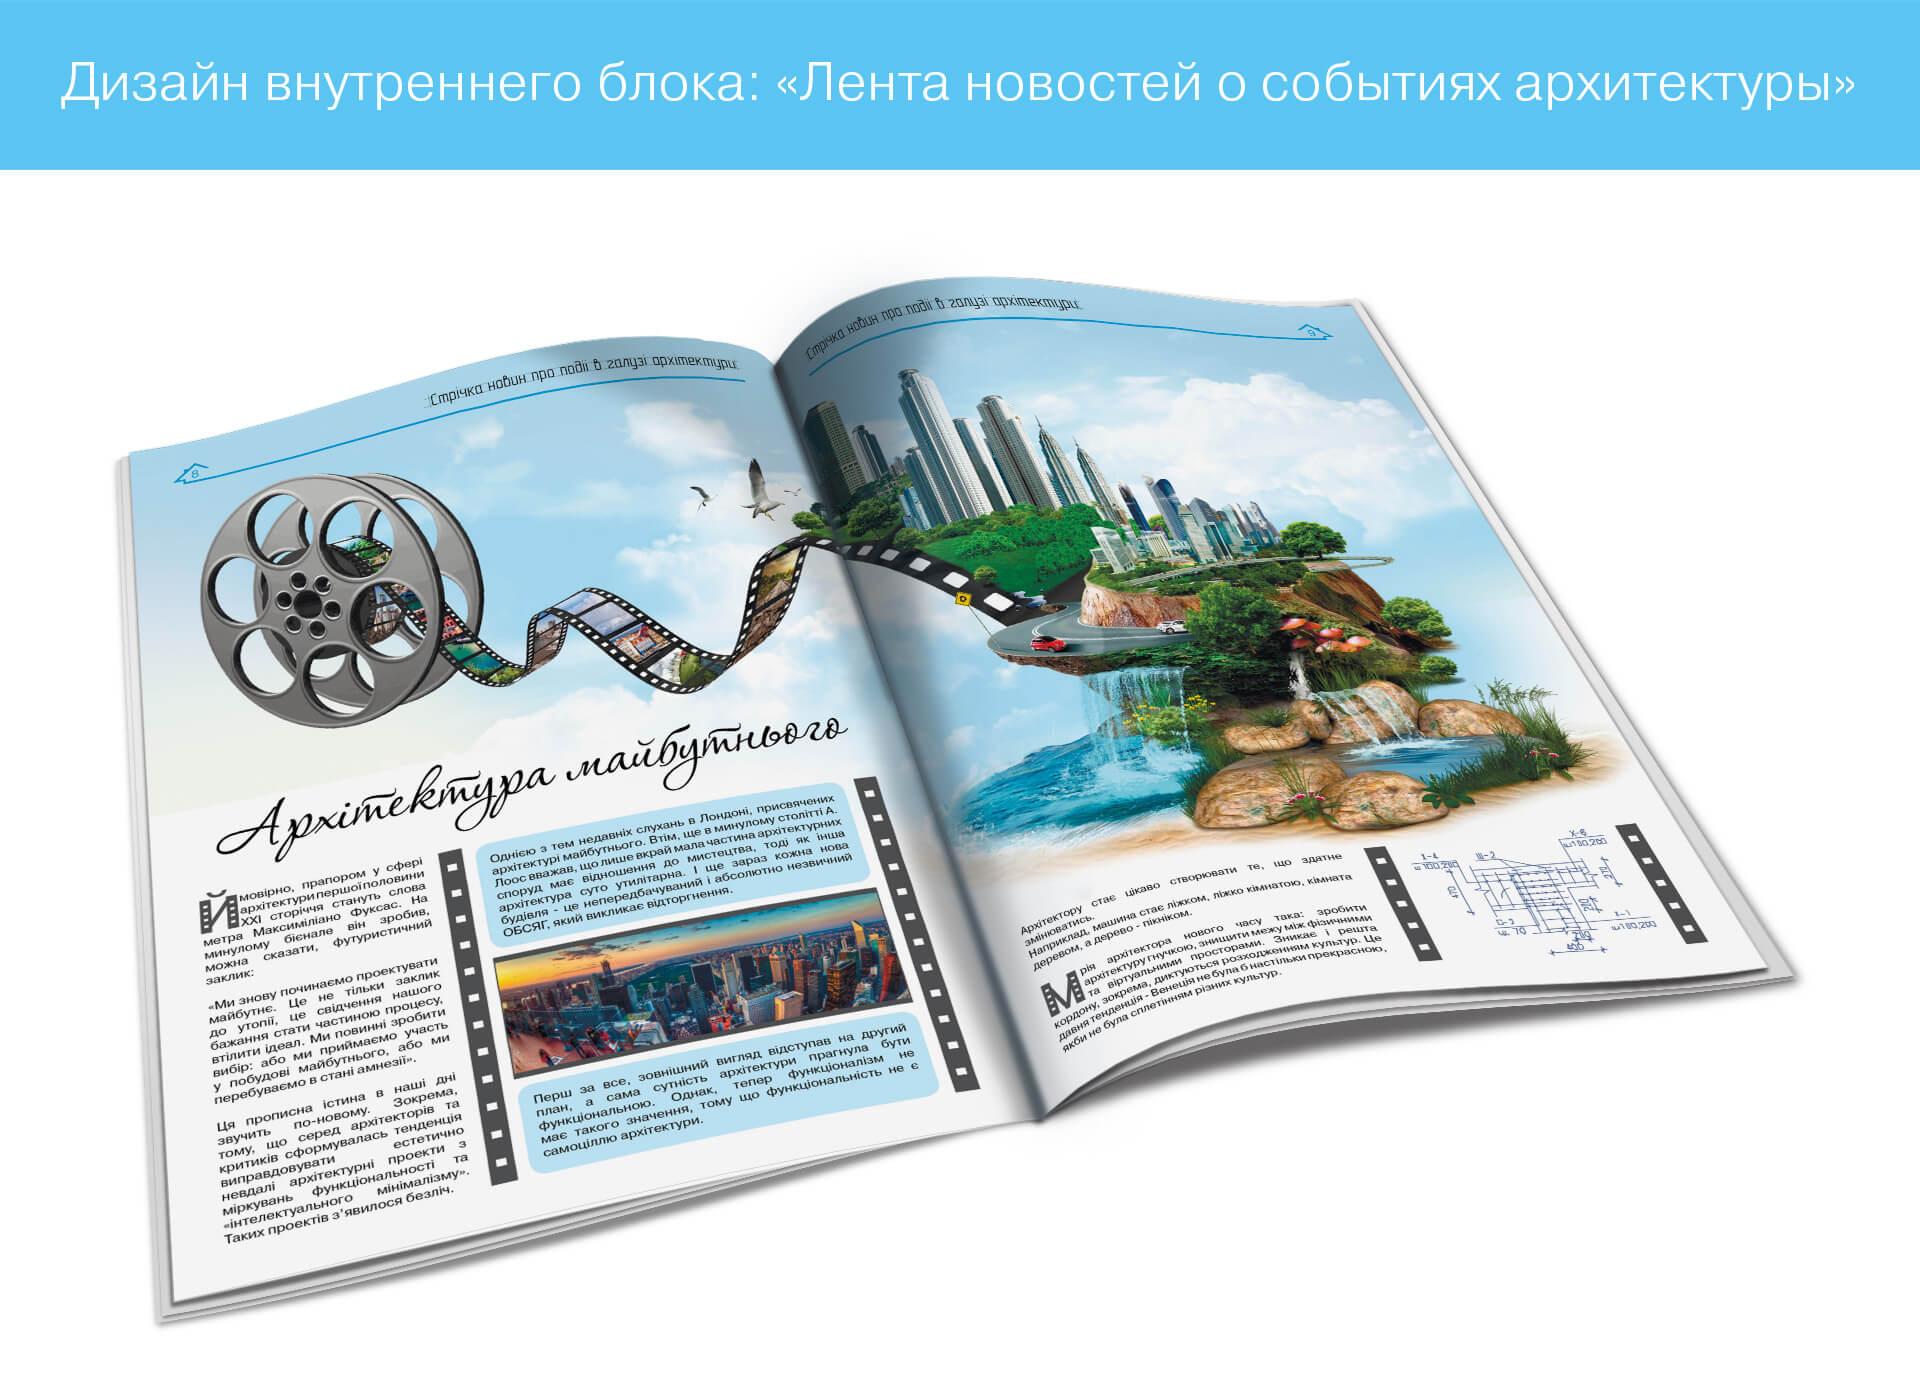 prokochuk_irina_architectural-magazine-sporuda_5